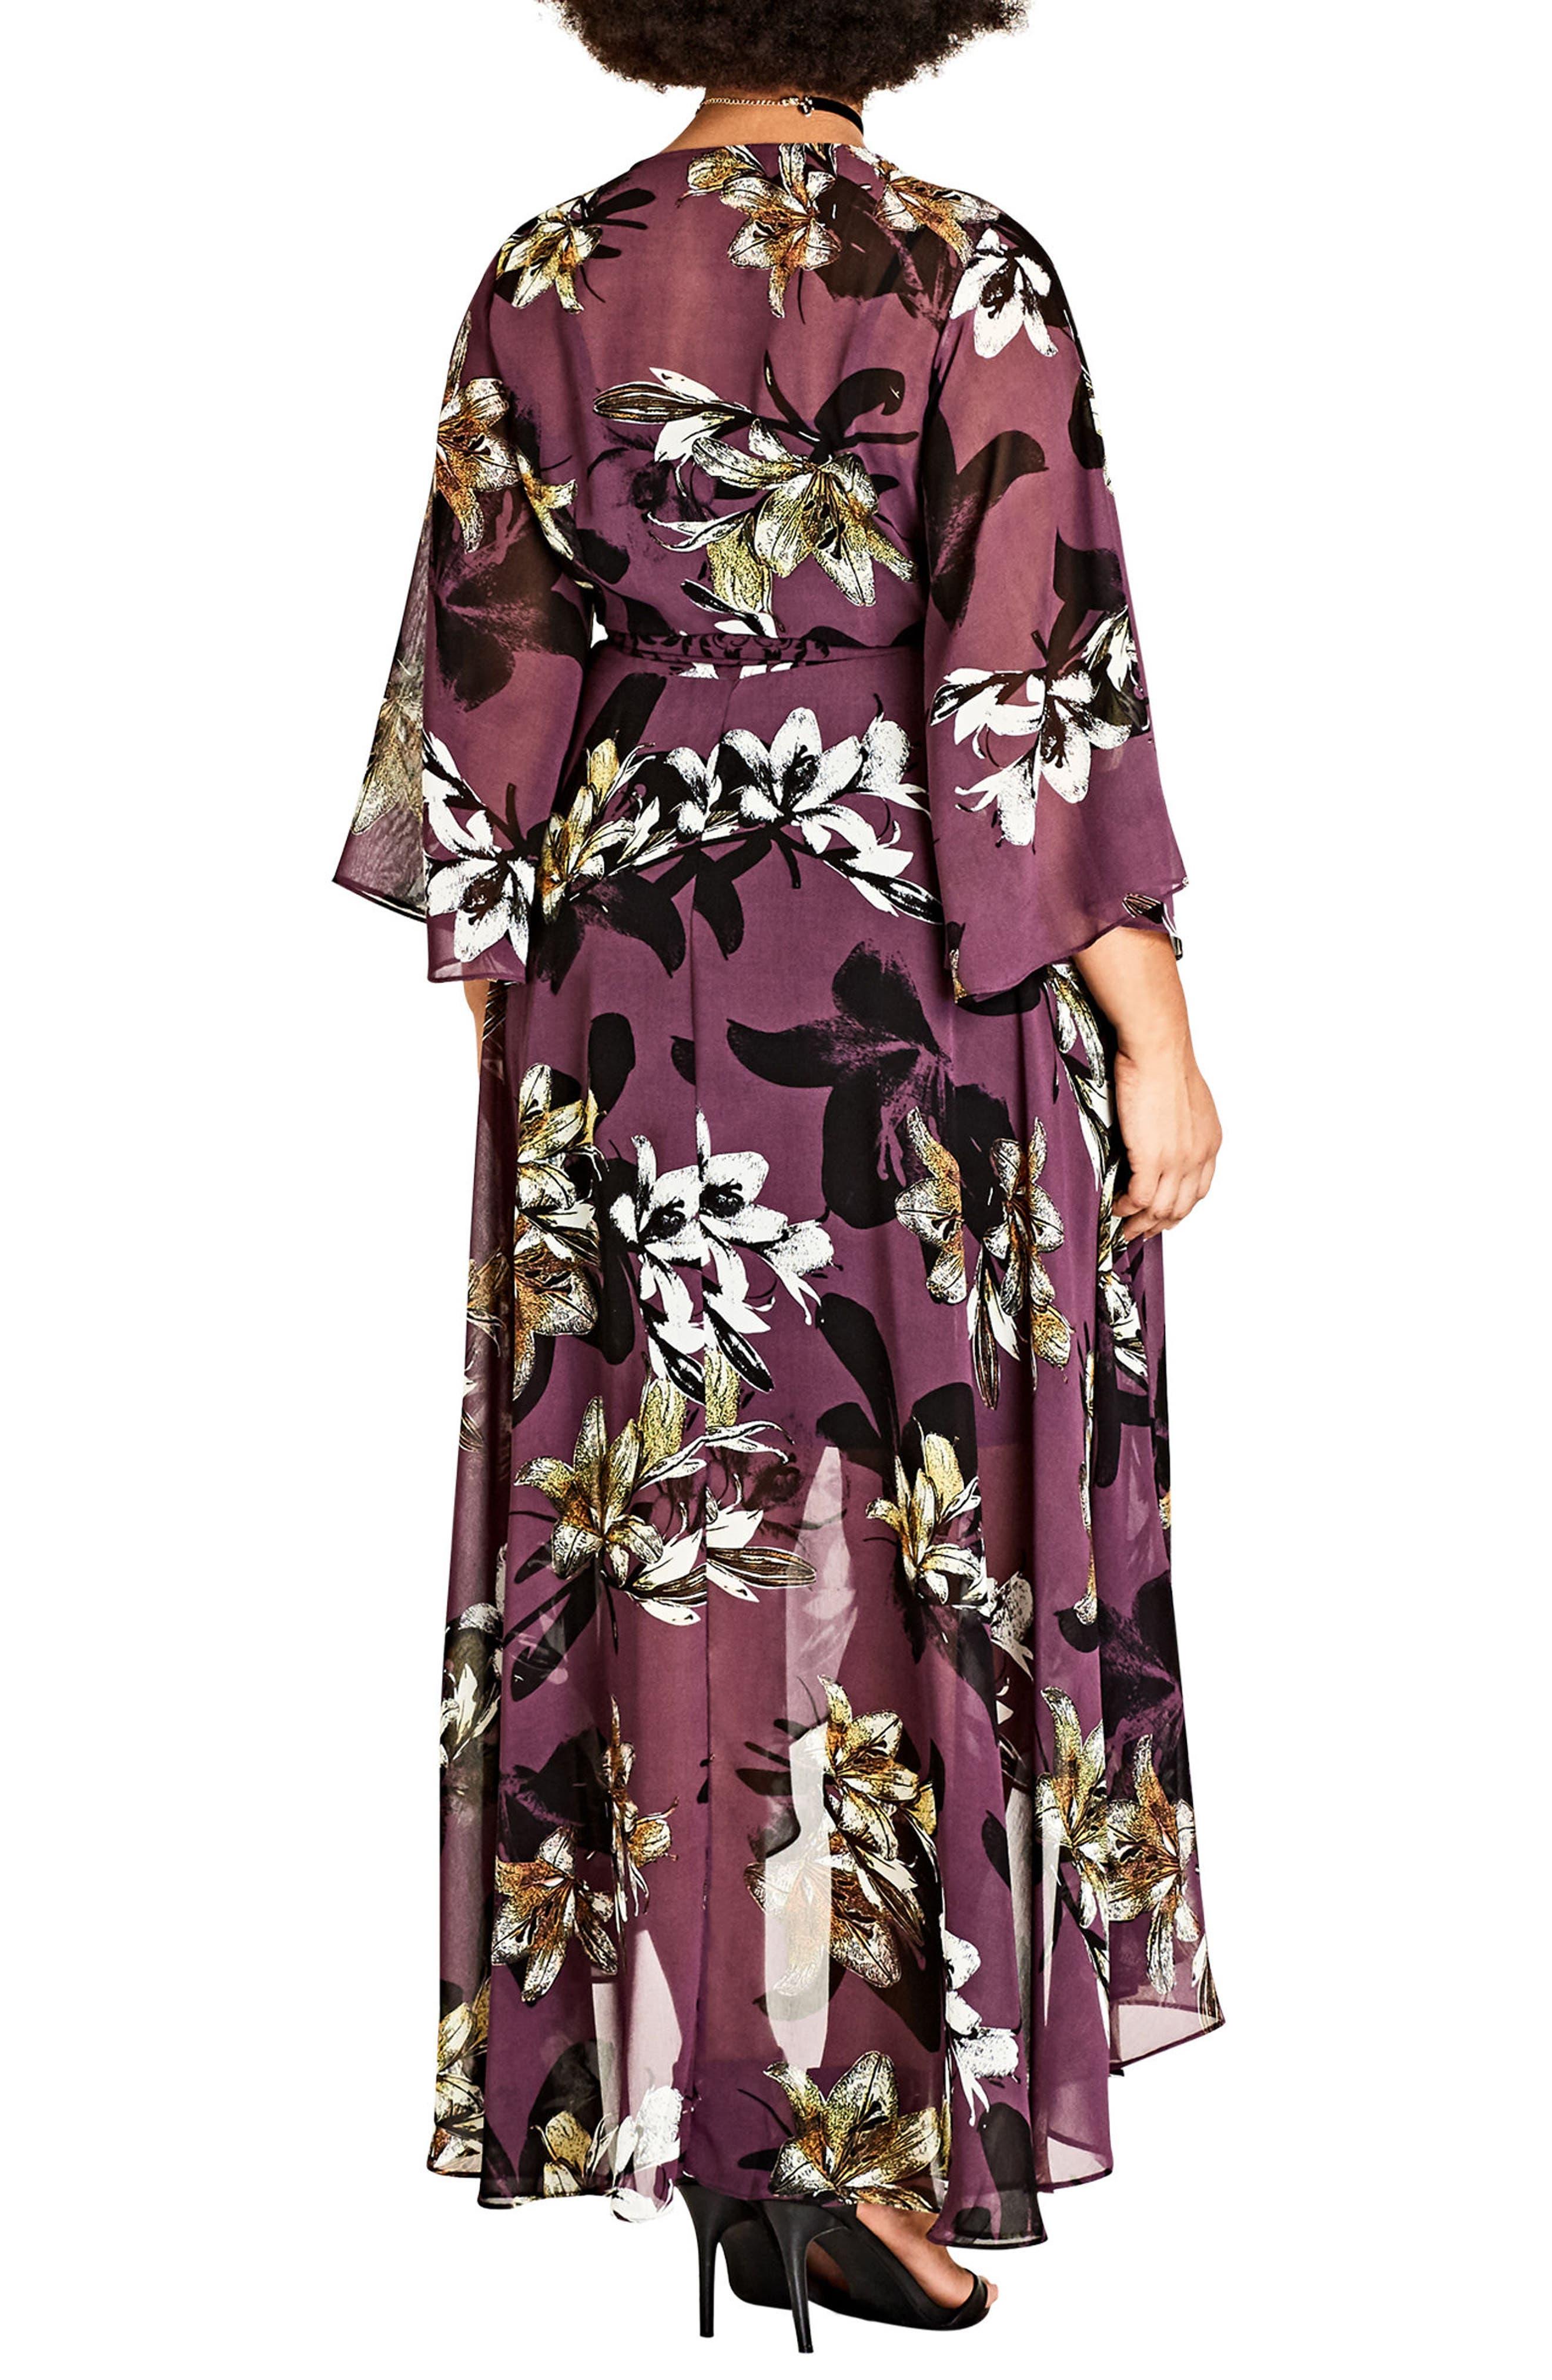 Burgundy Lily Maxi Dress,                             Alternate thumbnail 2, color,                             931